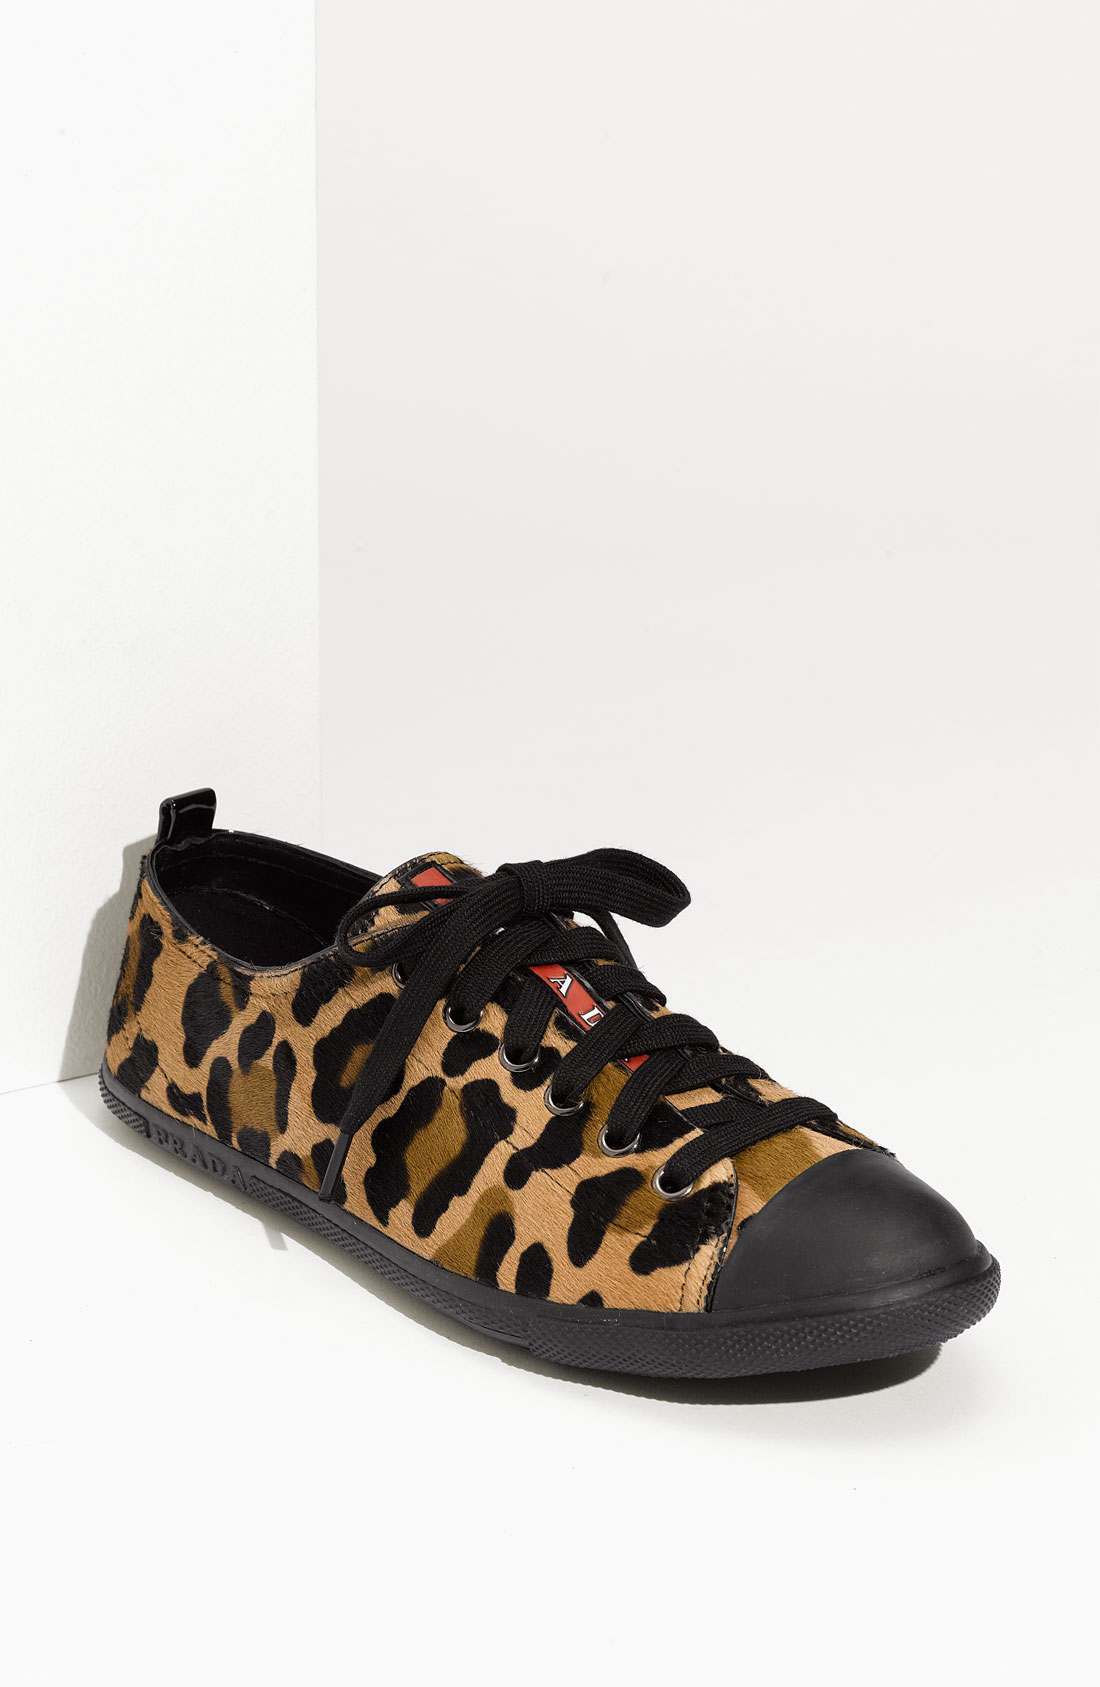 leopard sneakers prada leopard print sneaker   nordstrom xjdgttg